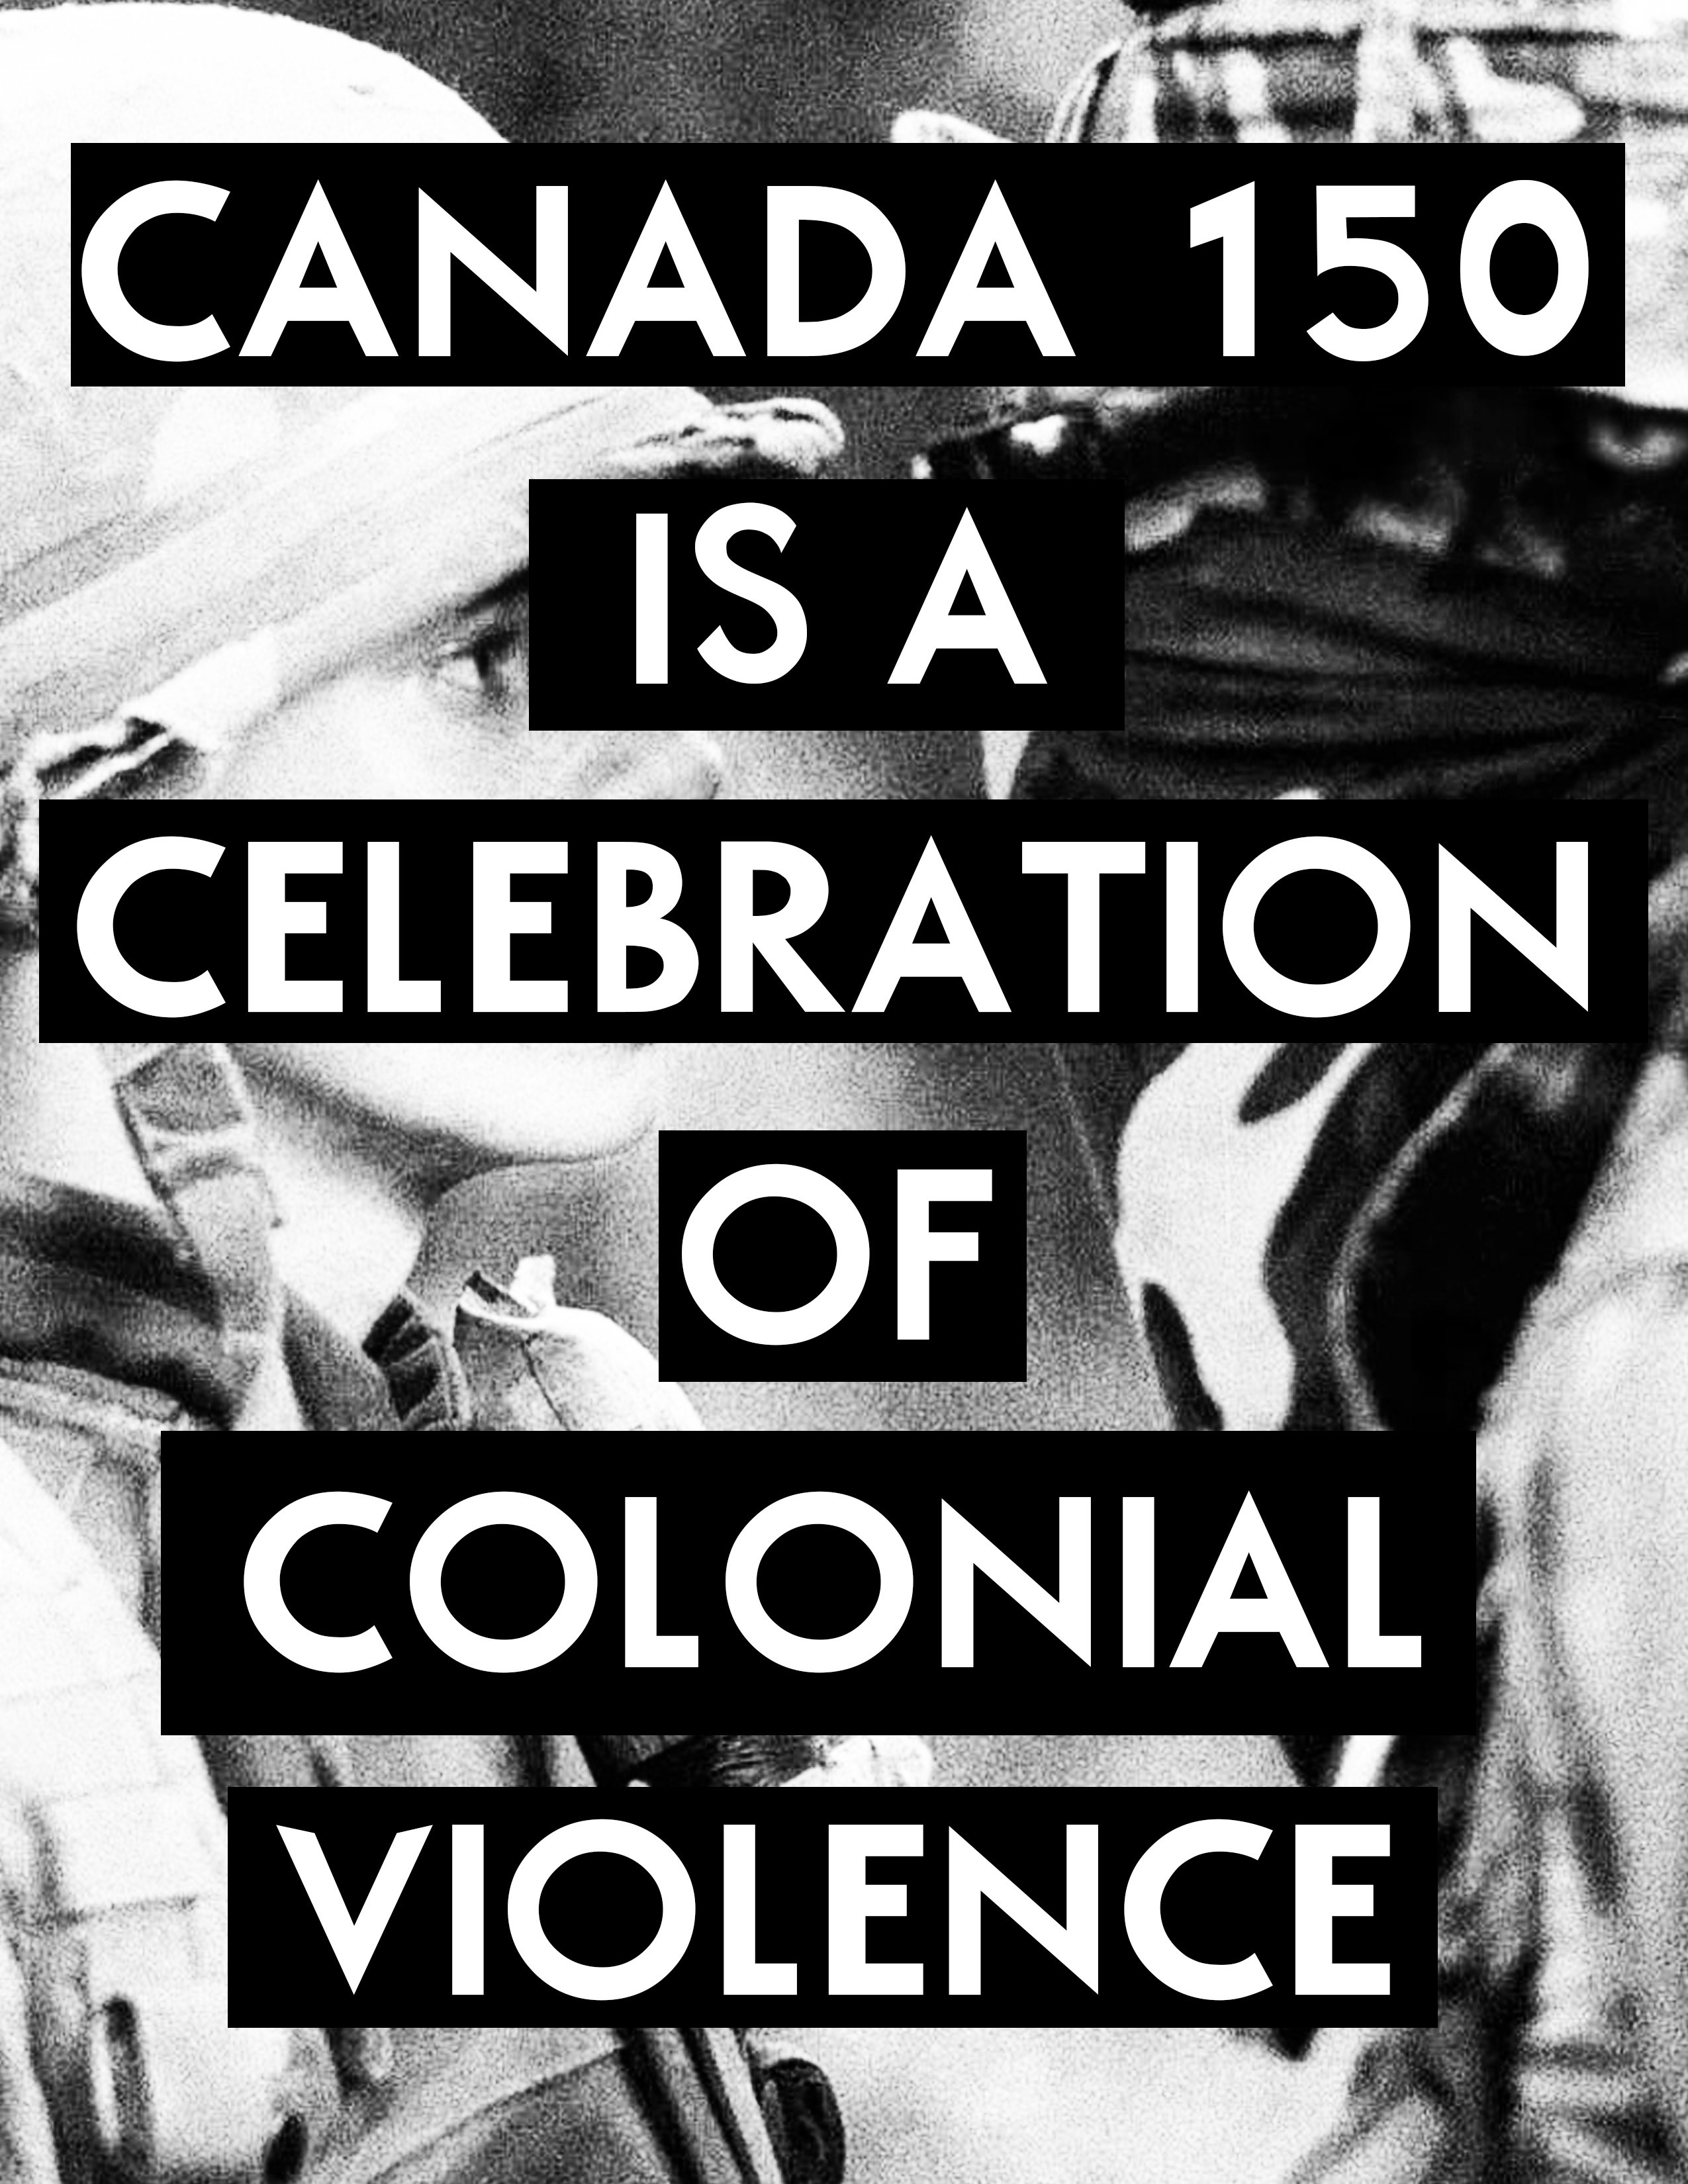 2_Colonial_Violence.jpg